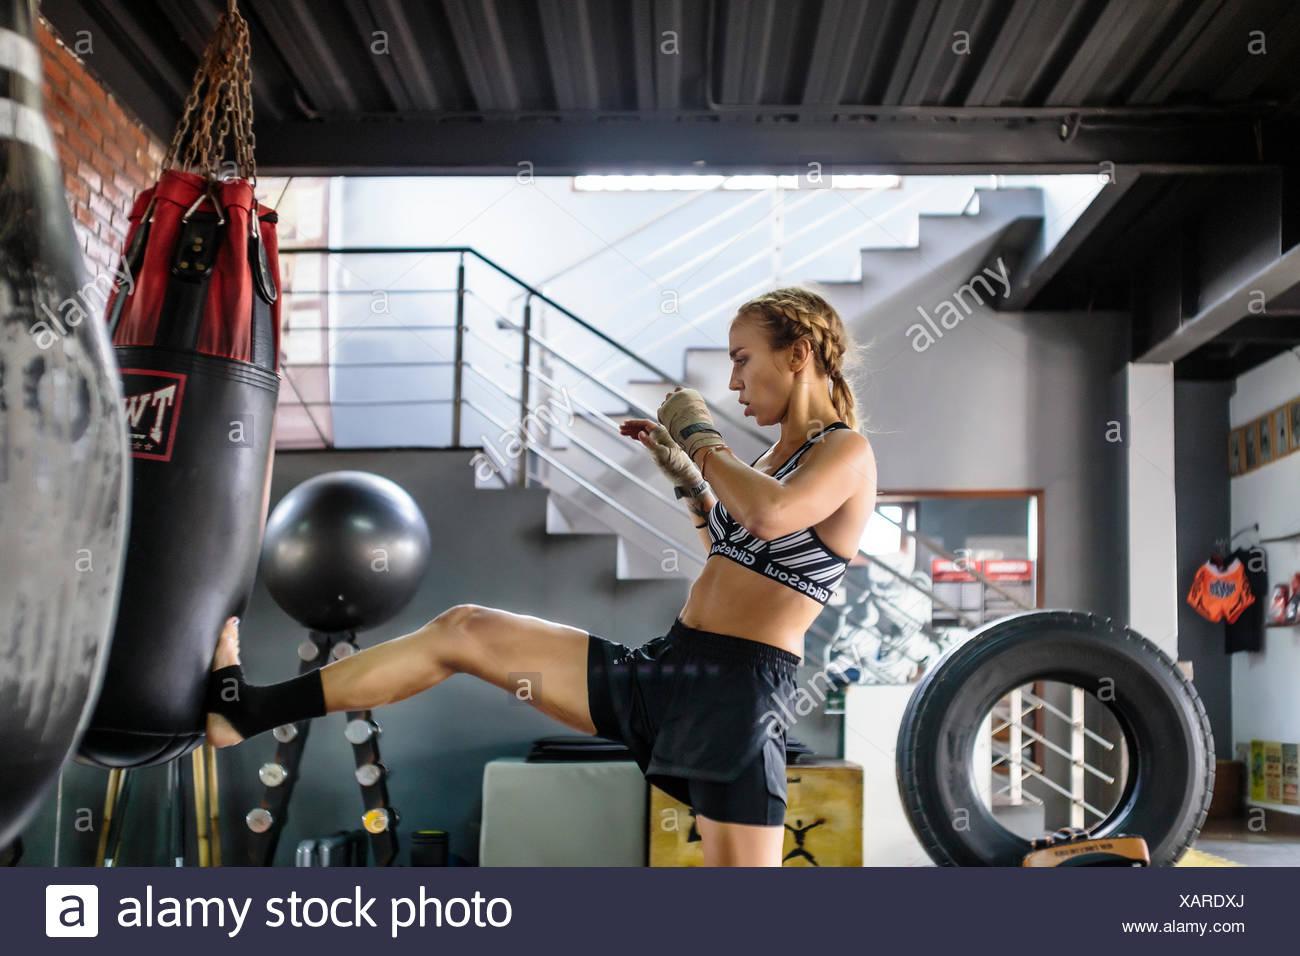 Side view photograph of female kickboxer kicking punching bag, Seminyak, Bali, Indonesia Stock Photo